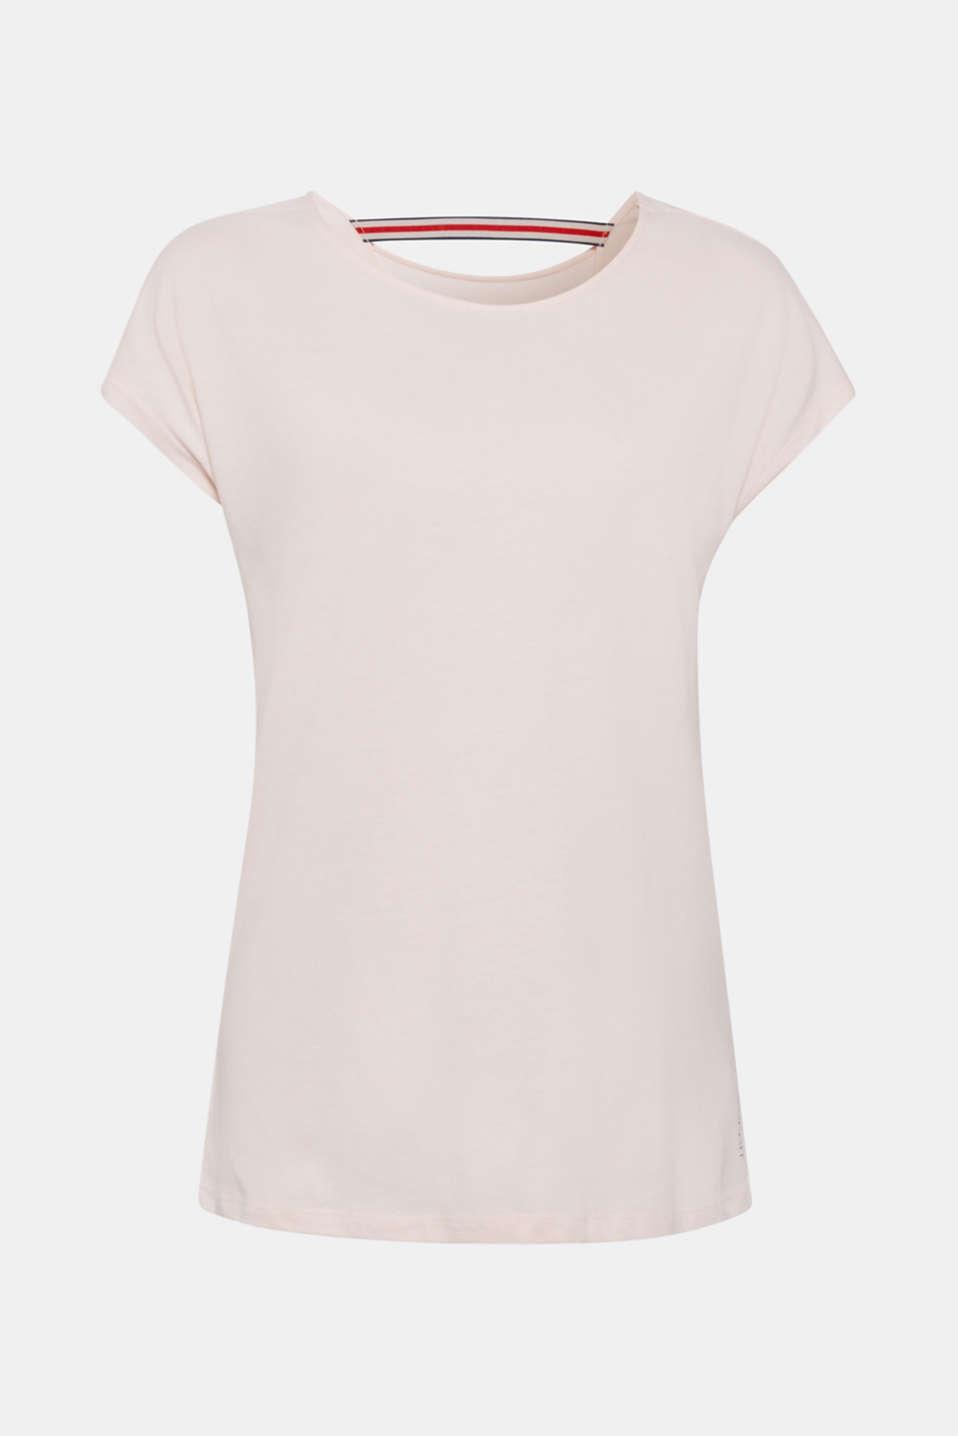 T-Shirts, LIGHT PINK, detail image number 5